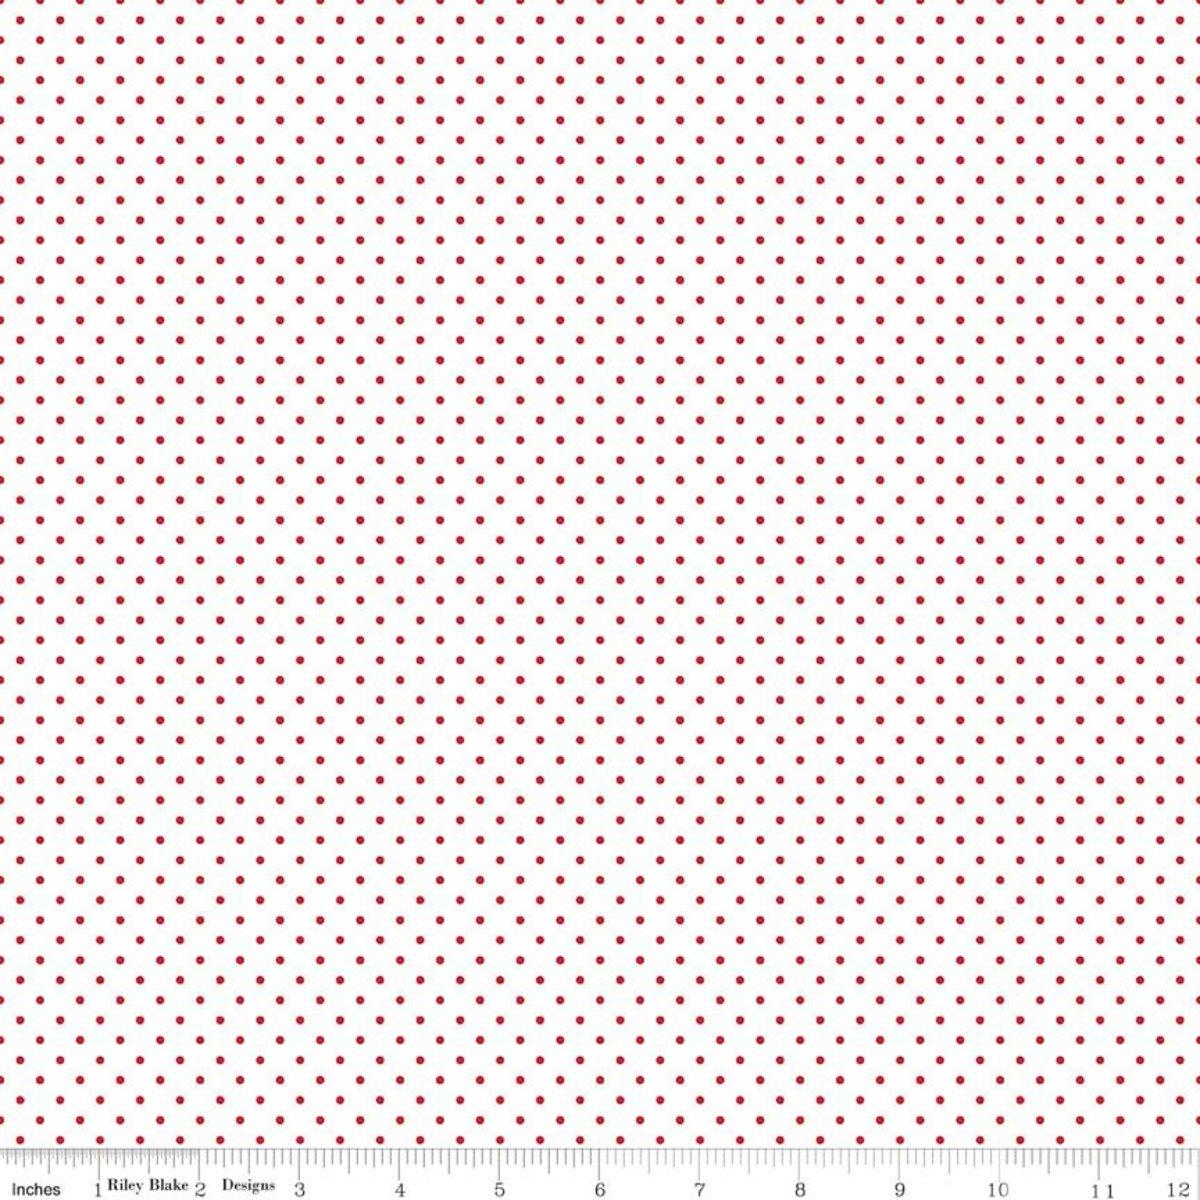 Riley Blake Designs, Swiss Dot - Swiss Dot Red on White